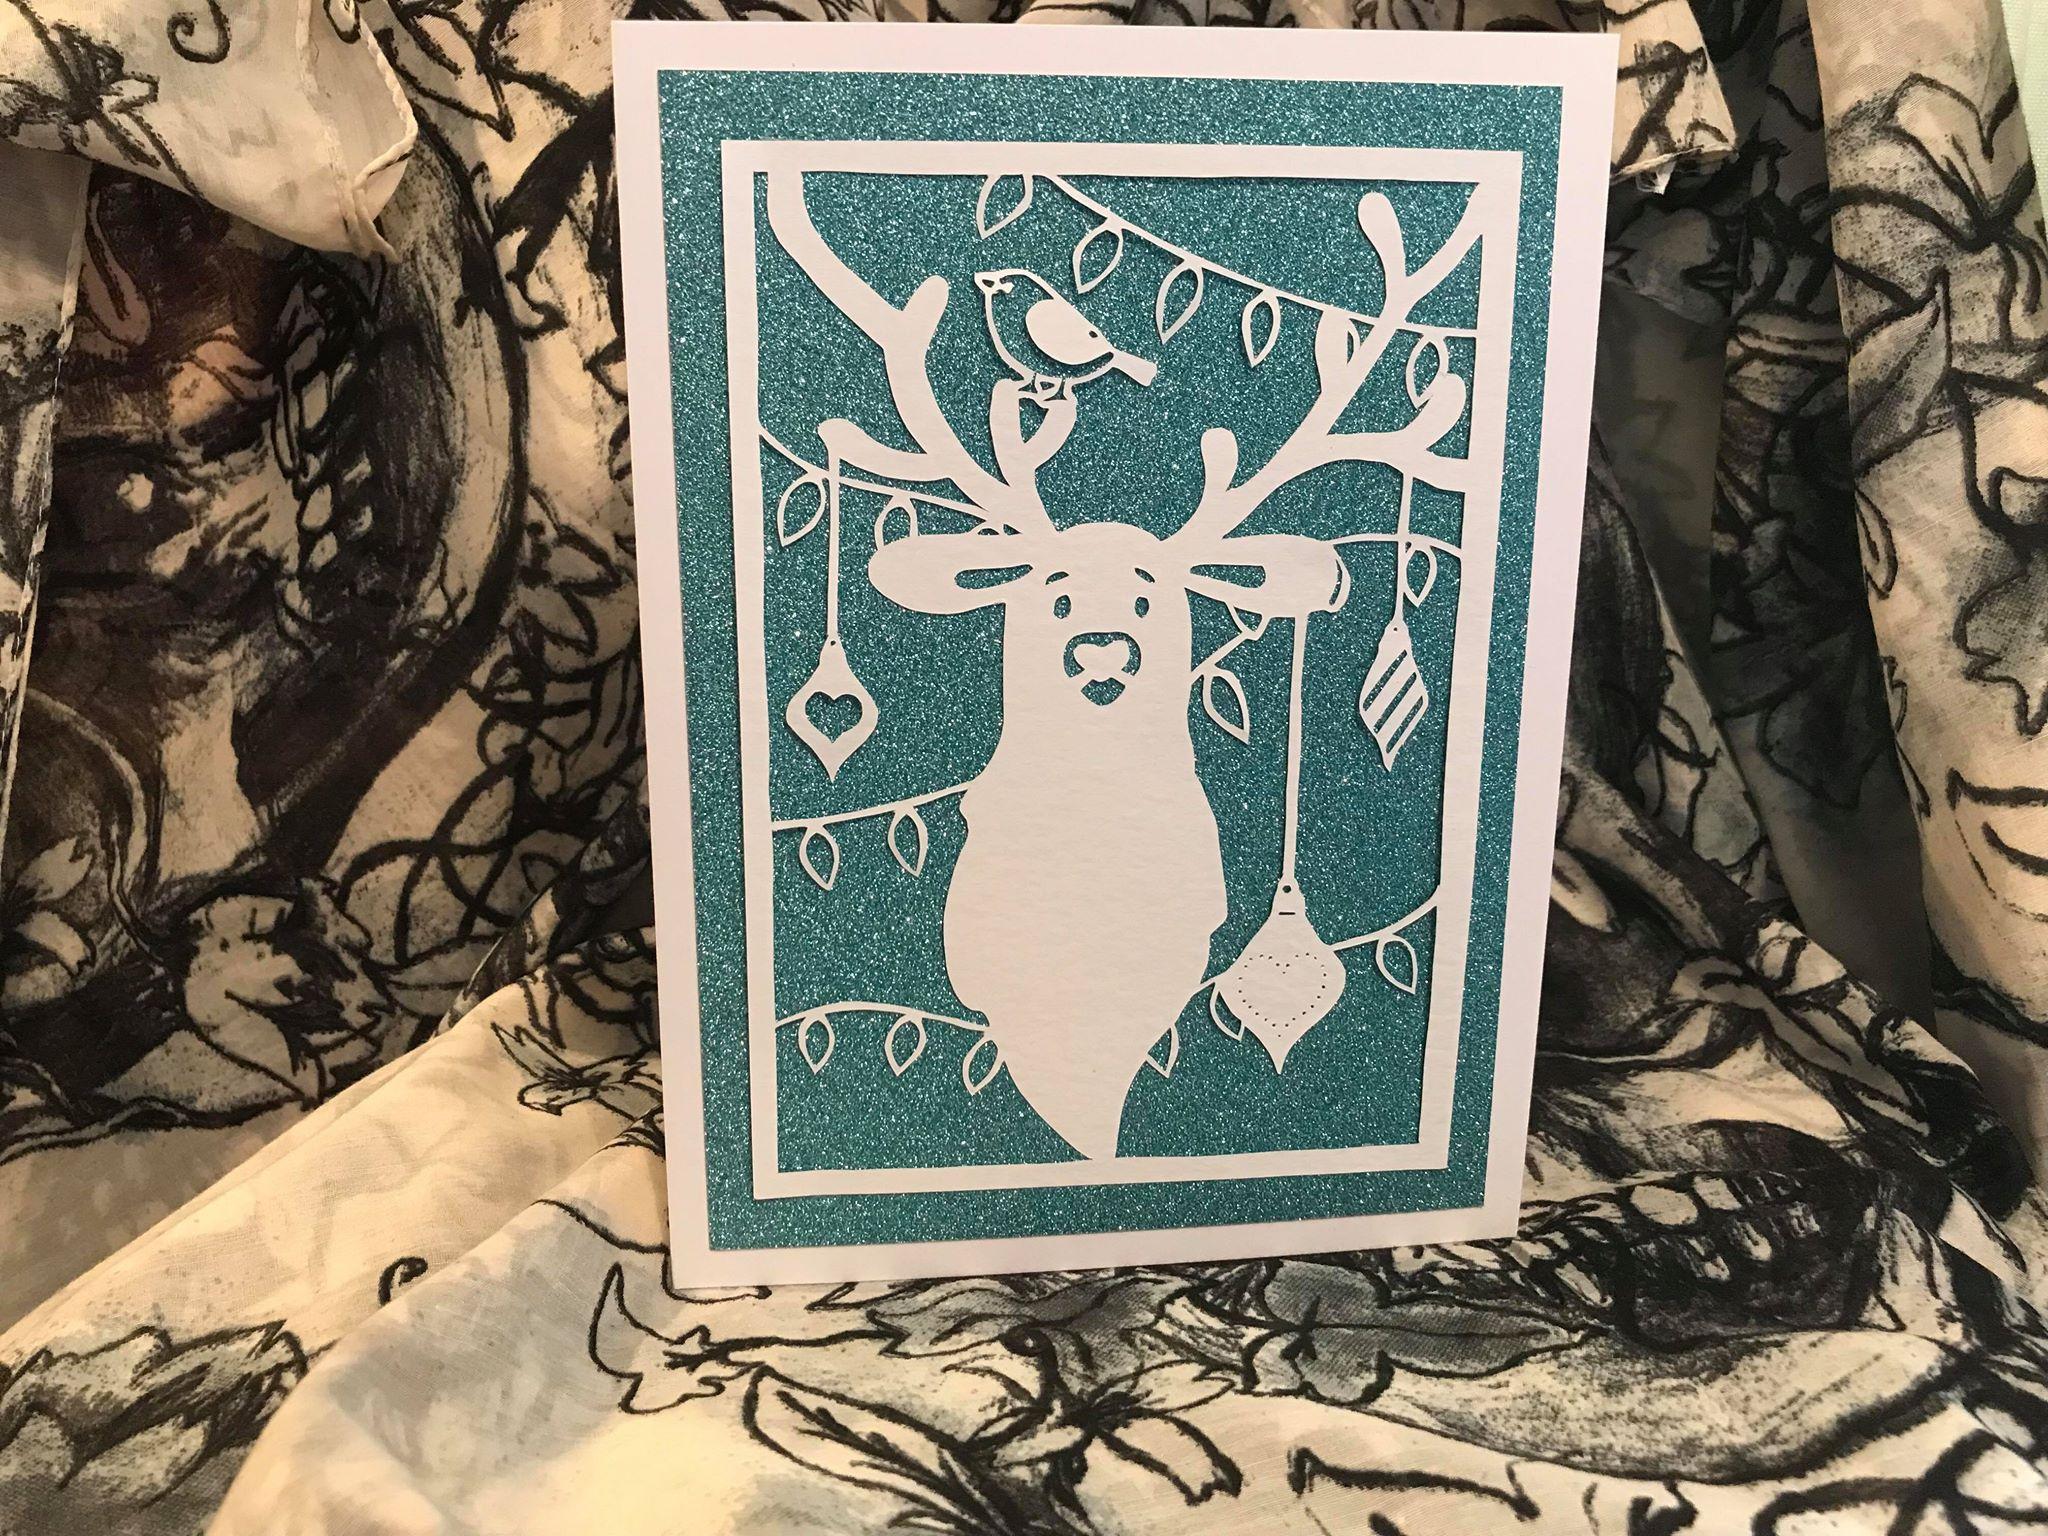 robin card quirkycraftsuk polar mistletoe and greetings xmas deer bird reindeer baubles merry christmas qcuk bear making